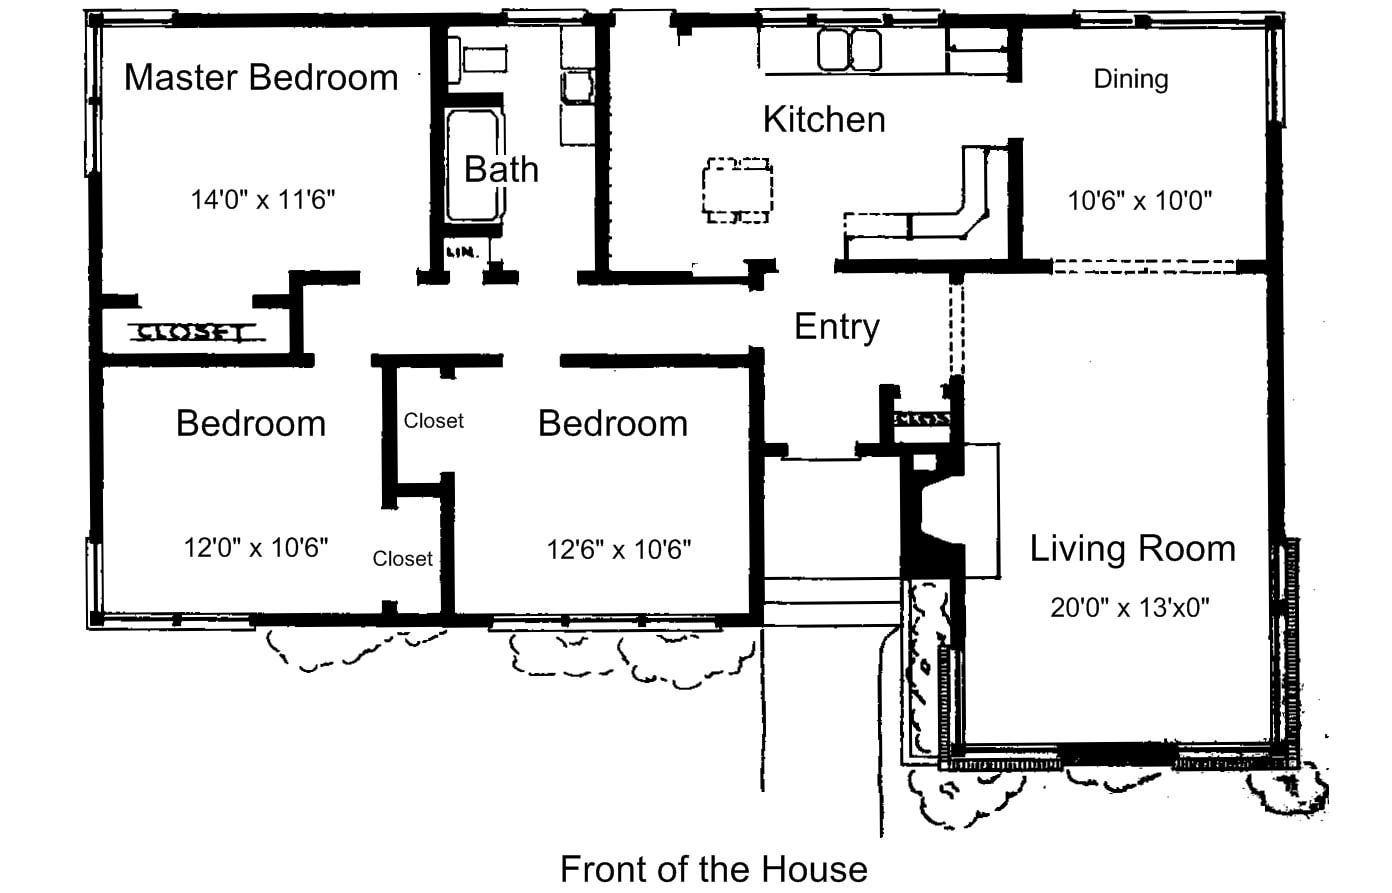 Stupendous 3 Bedroom Apartmenthouse Plans Cheap 3 Bedroom House Plans 3 Largest Home Design Picture Inspirations Pitcheantrous